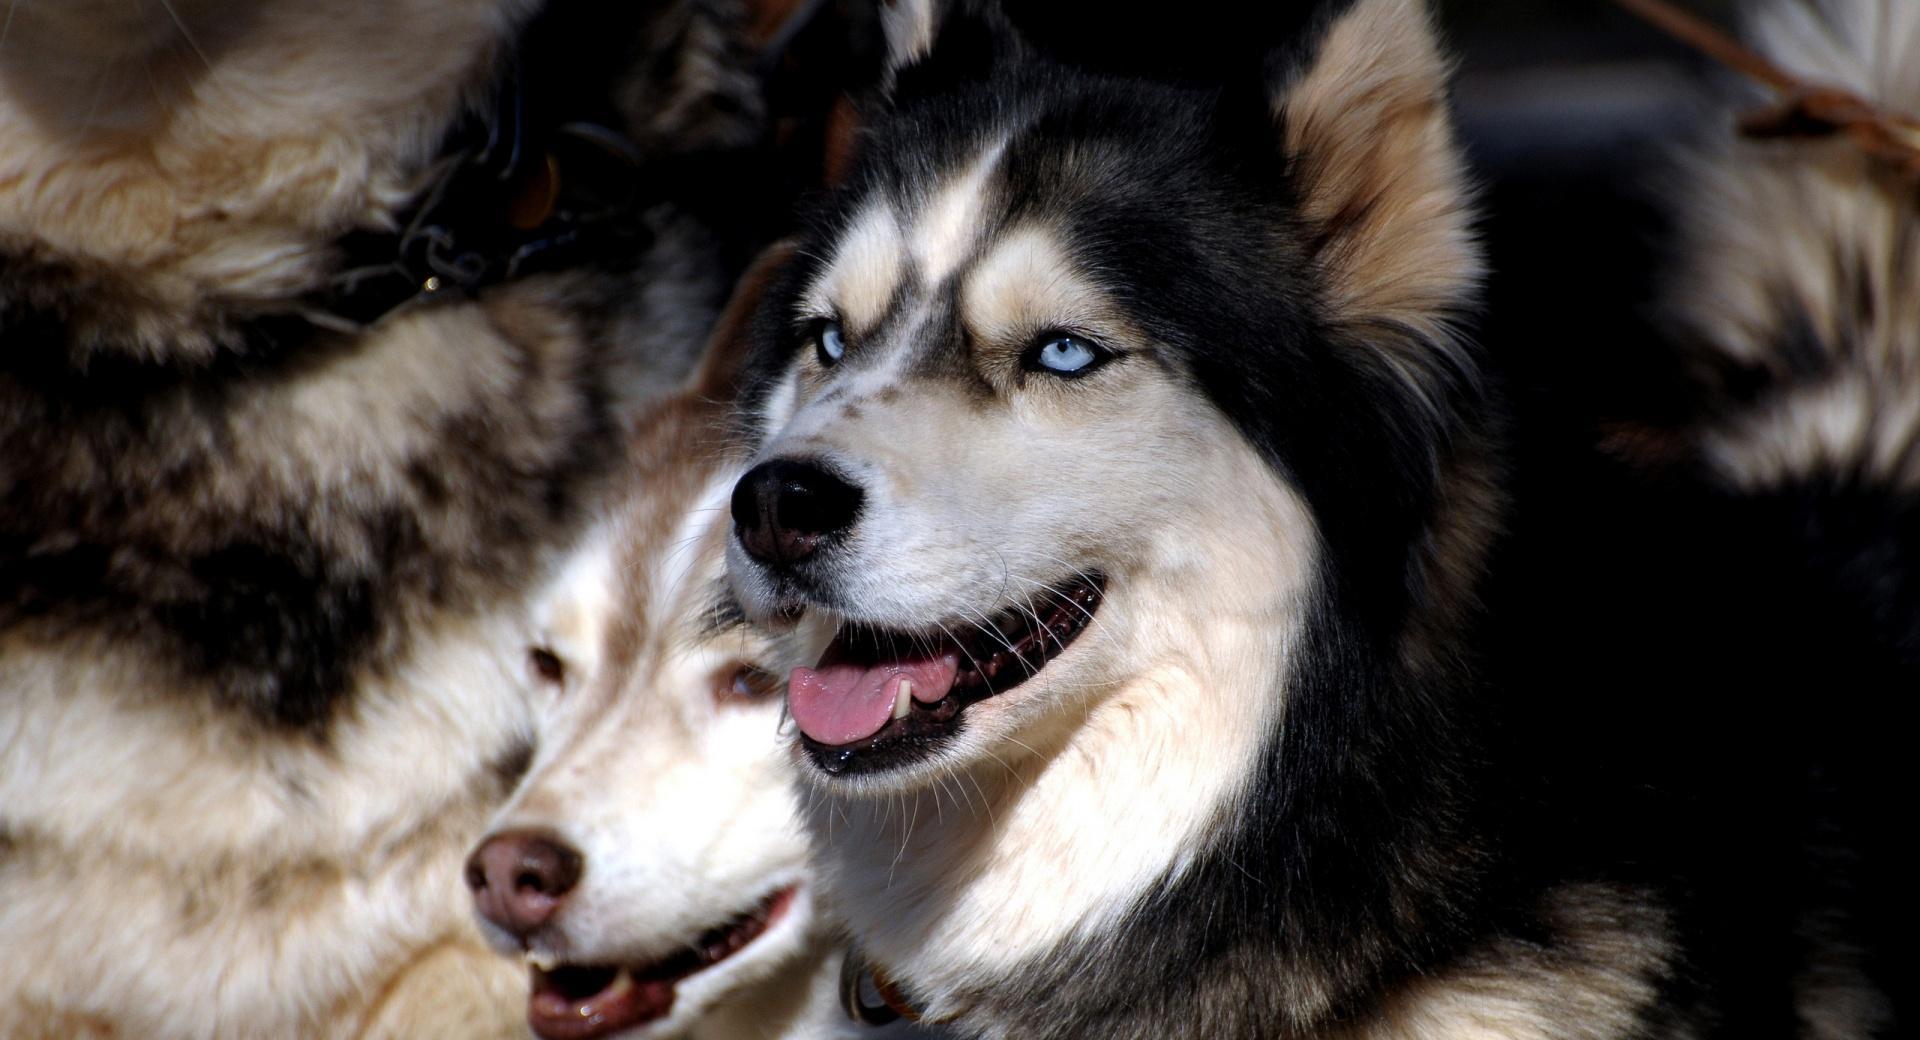 Husky Dogs wallpapers HD quality